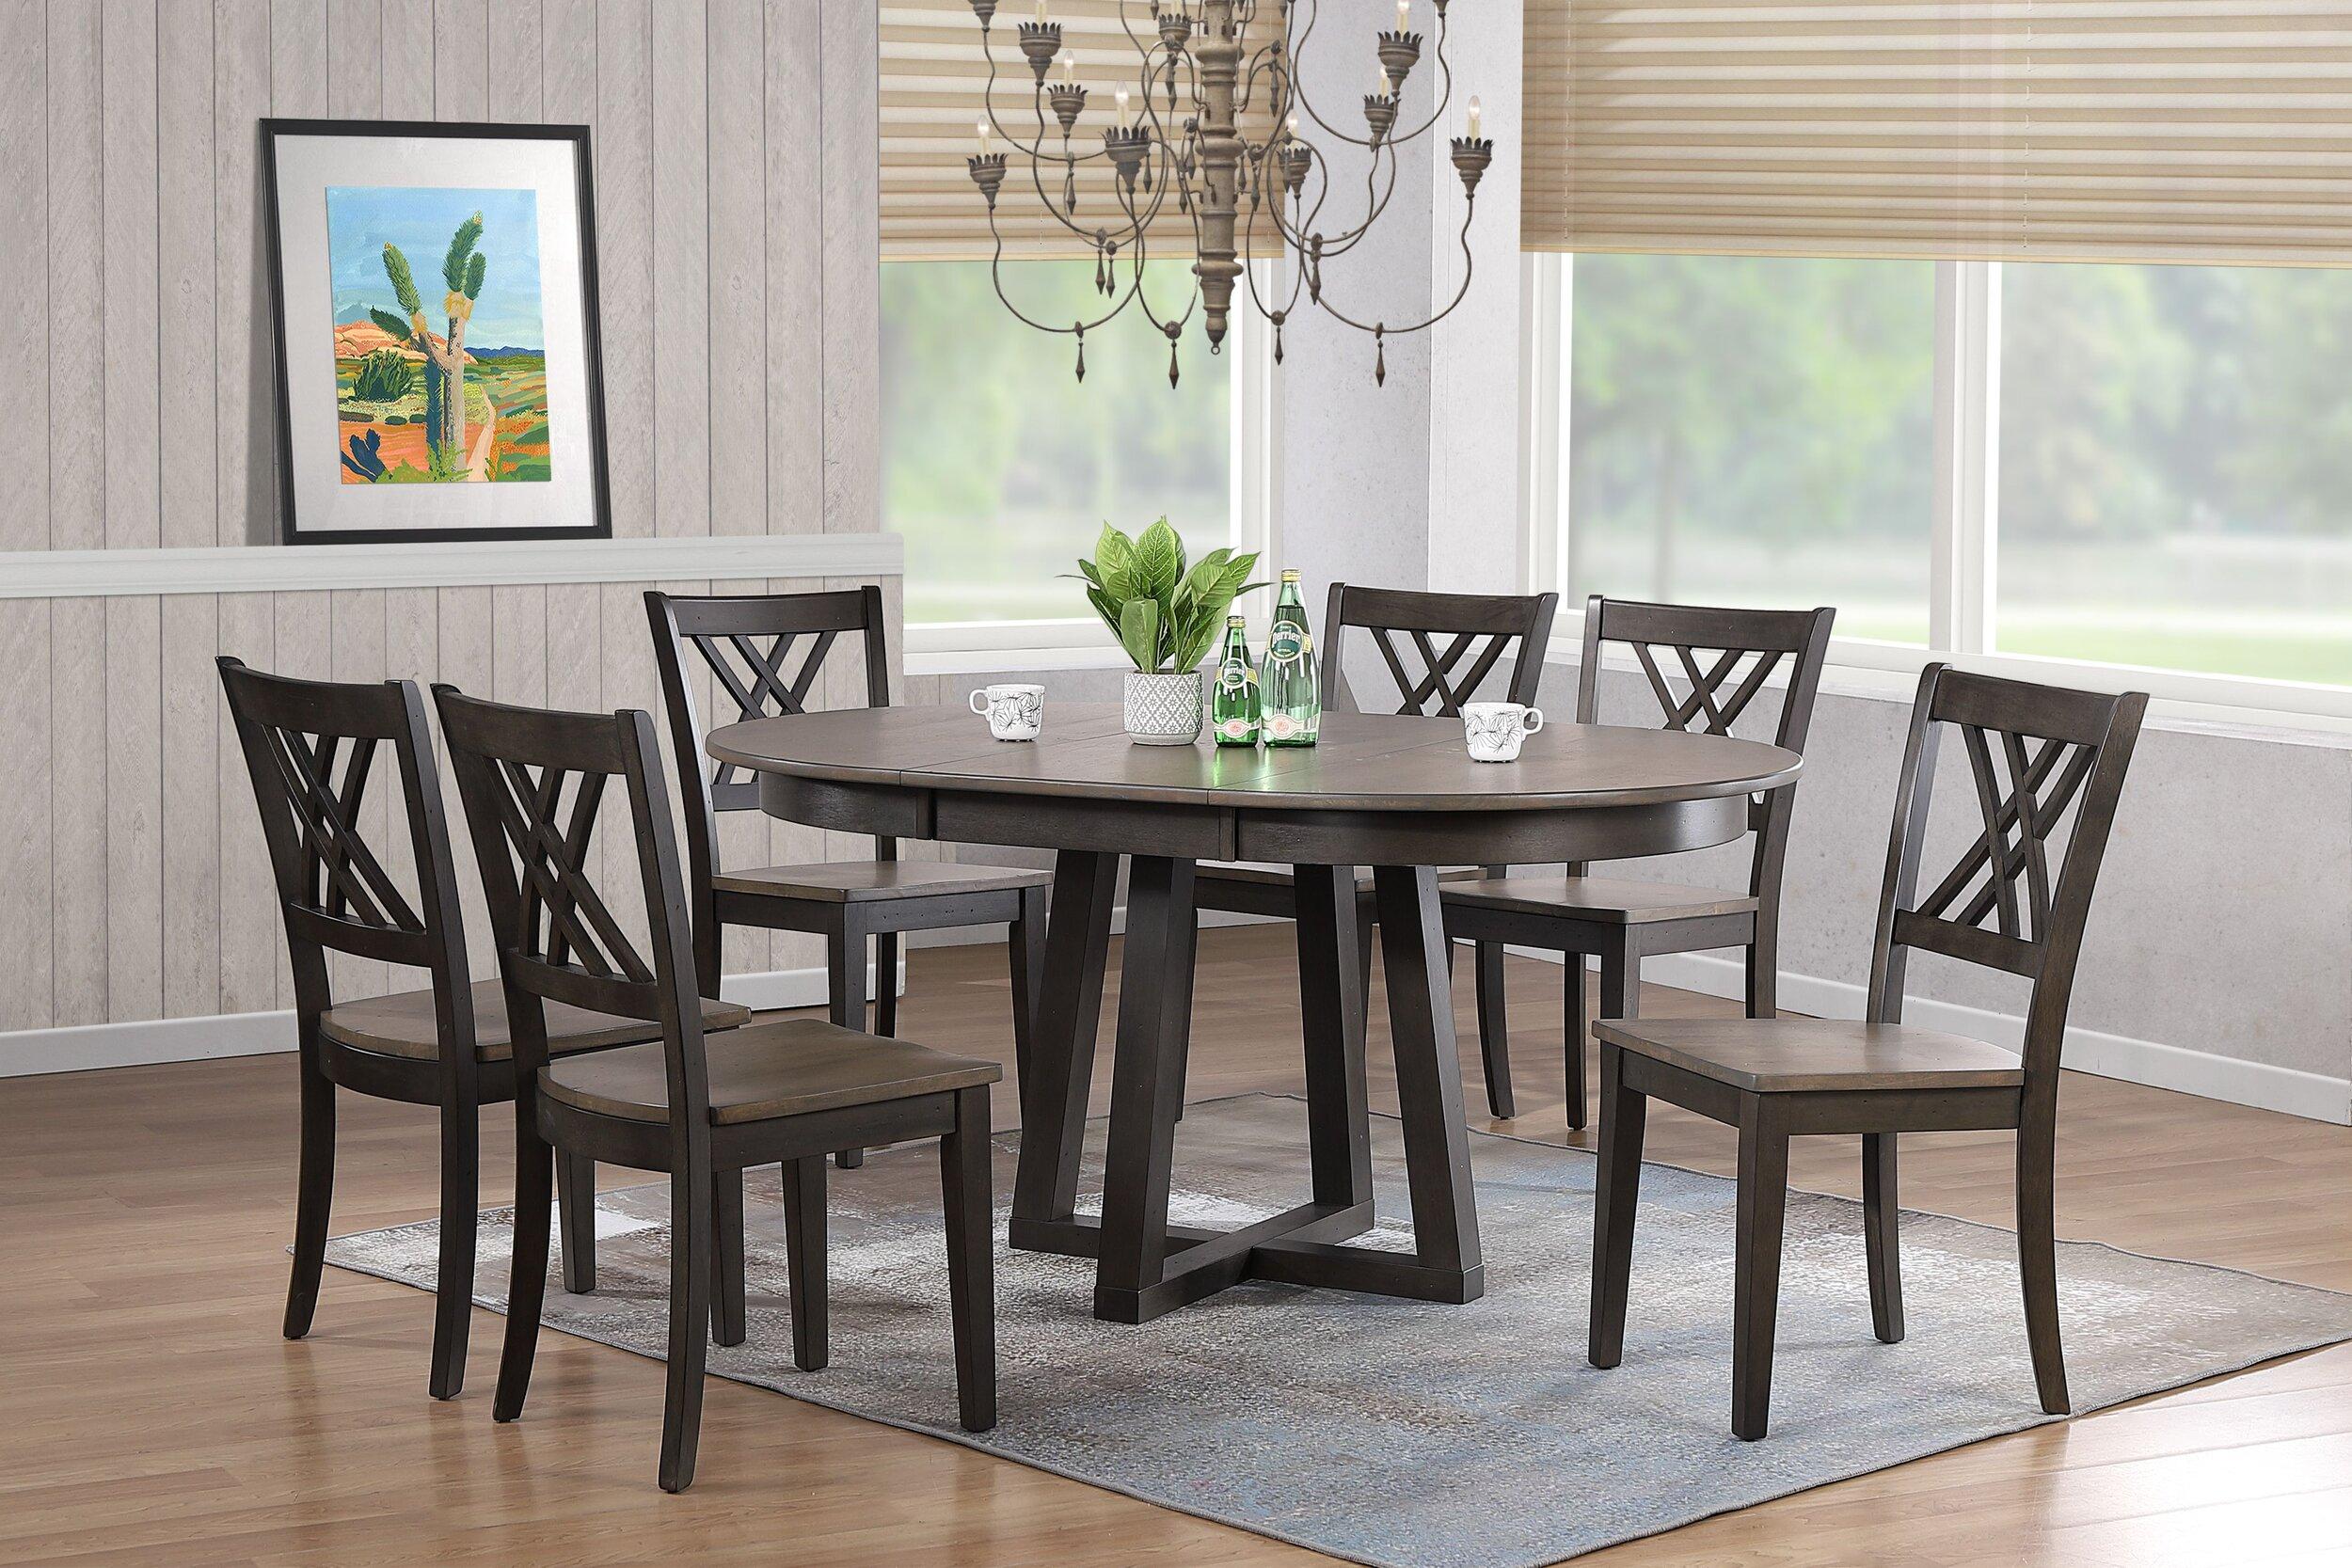 "45""x45""x63"" Antiqued Grey Stone Black Stone Double X-Back 7-Piece Cross Pedestal Dining Set"